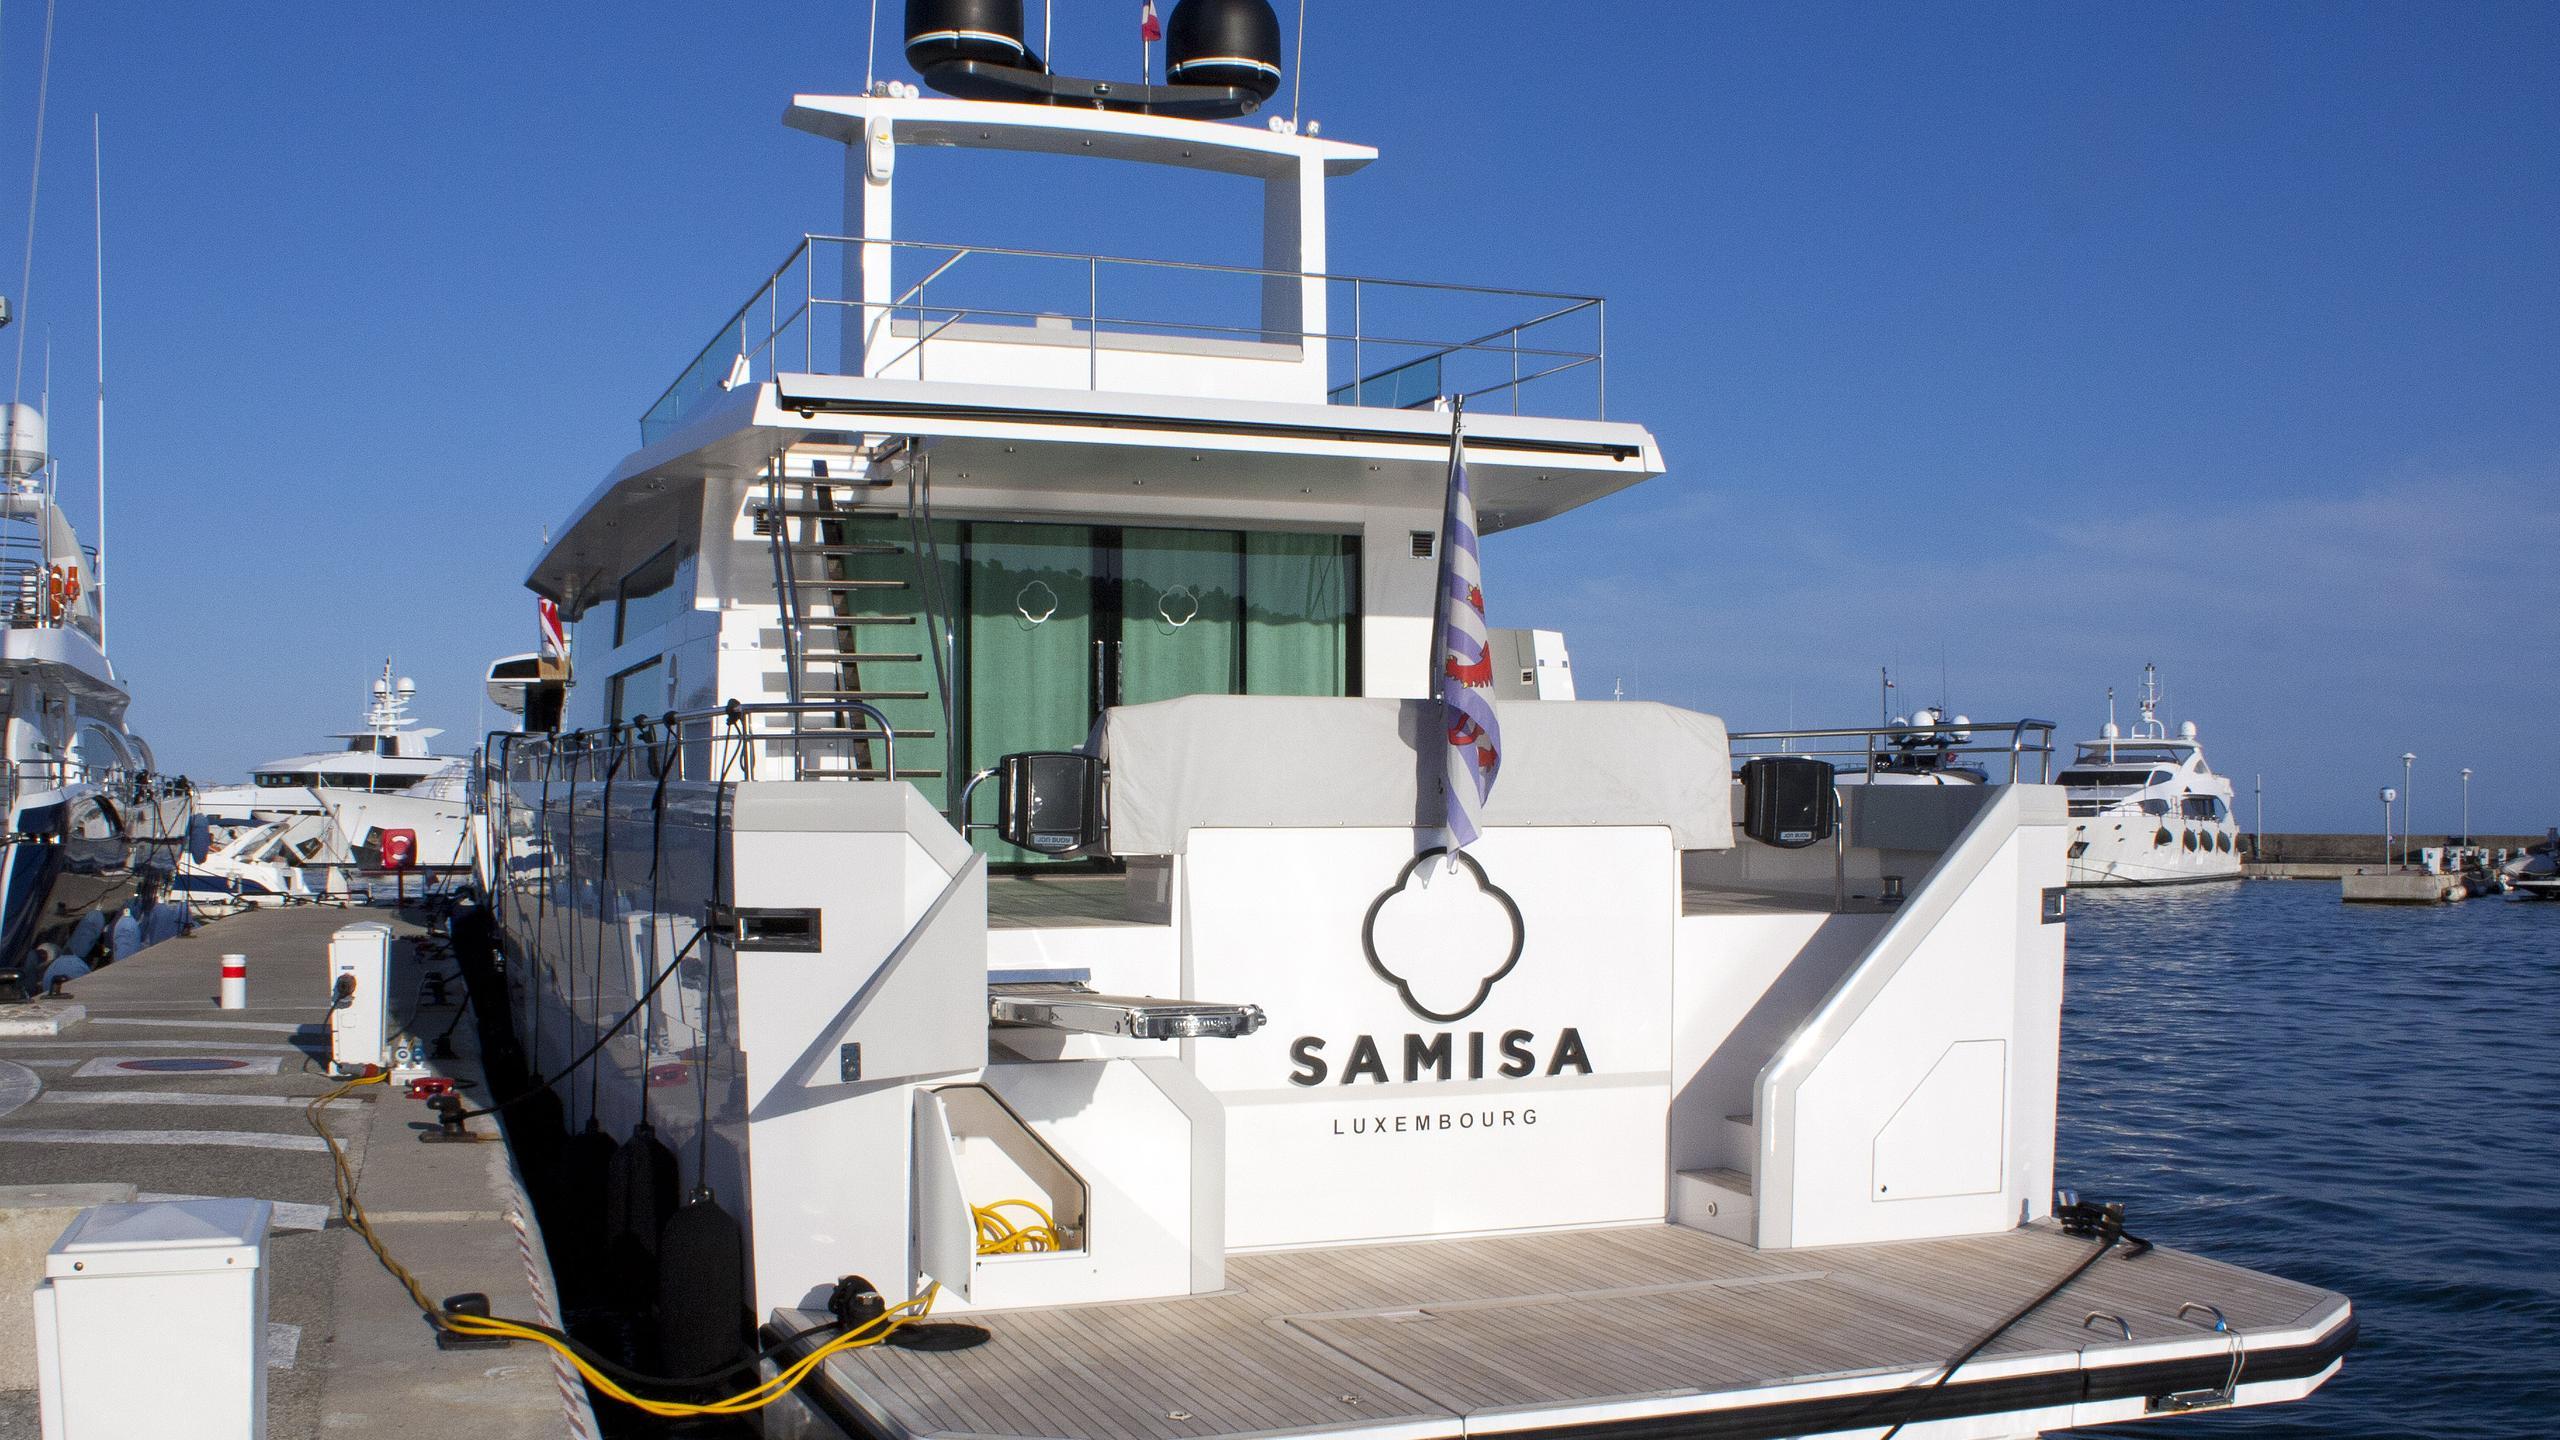 samisa-motor-yacht-delta-powerboats-2014-26m-moored-stern